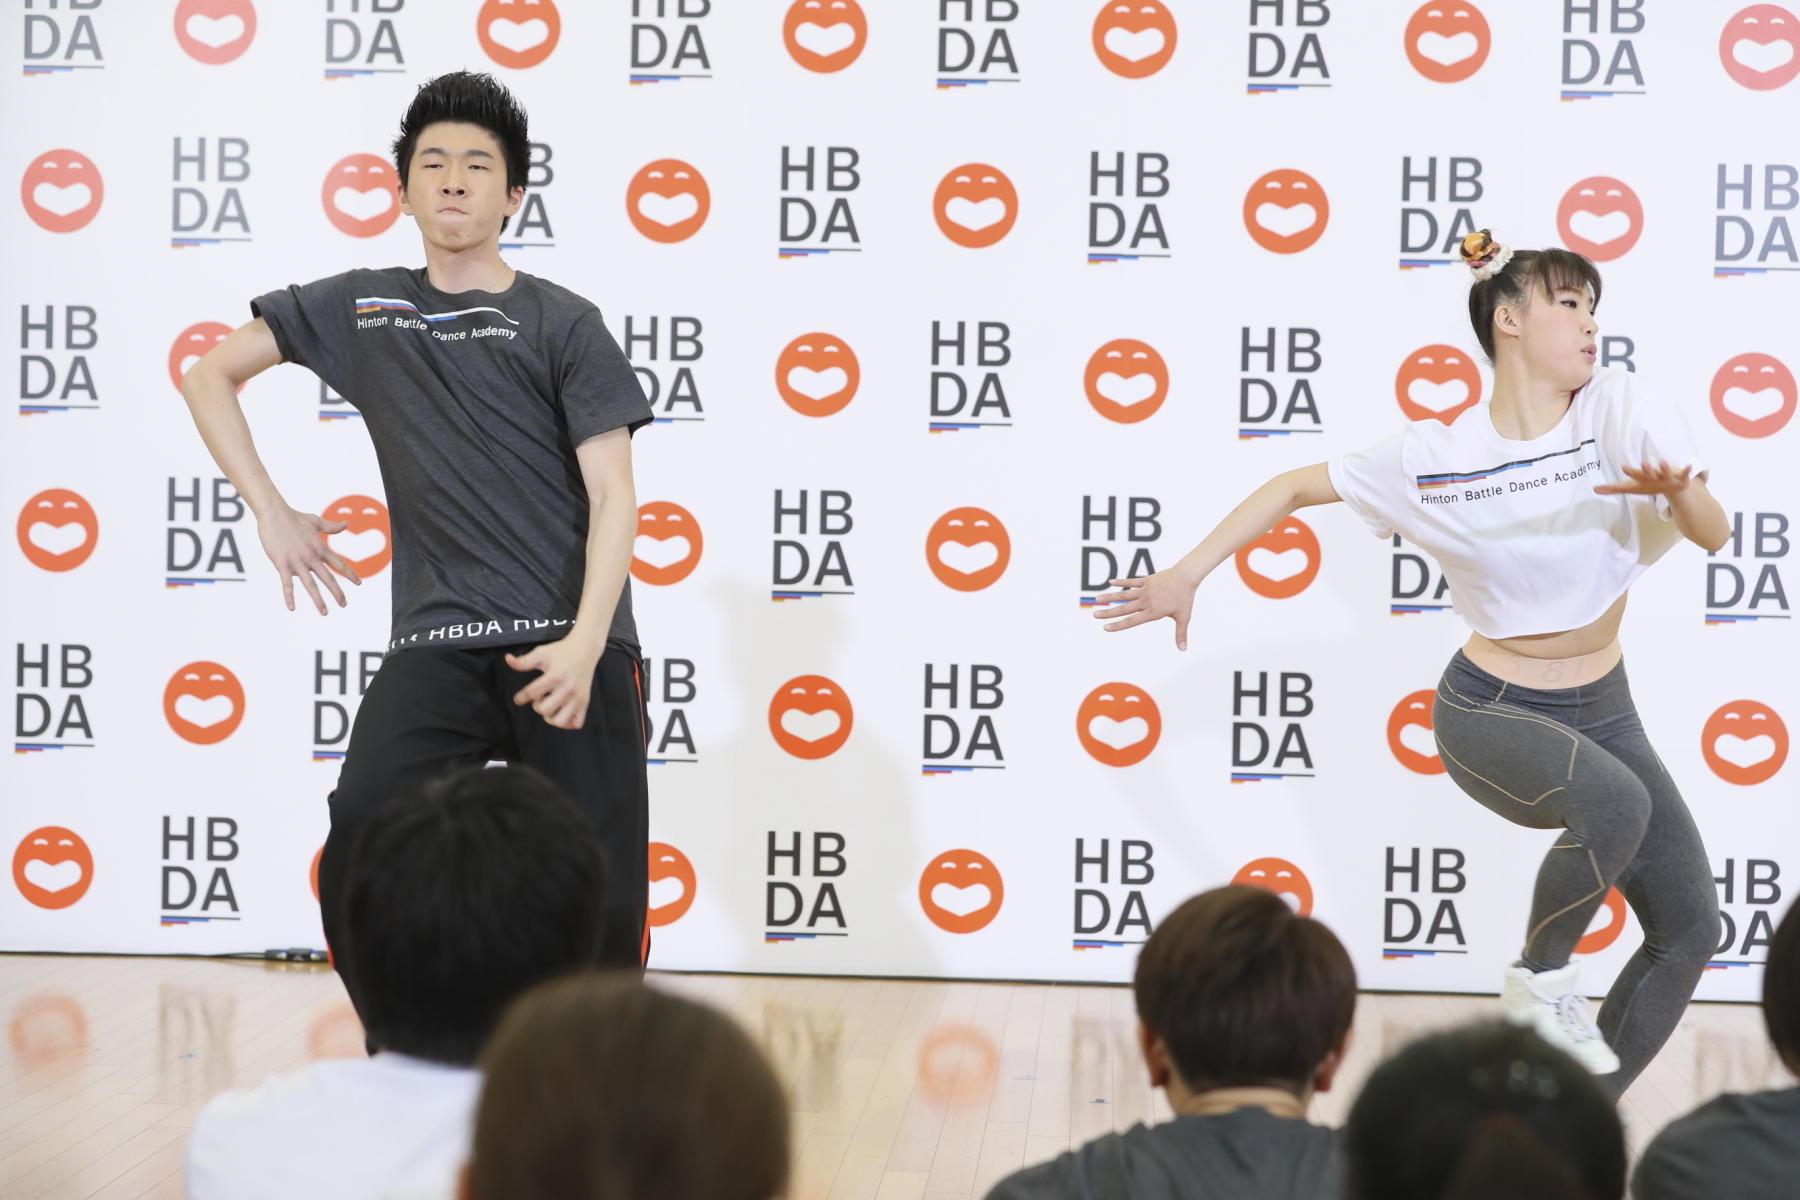 http://news.yoshimoto.co.jp/20170411183954-184c73f8d4a419bb48463b04a79f53f8d45f12ed.jpg